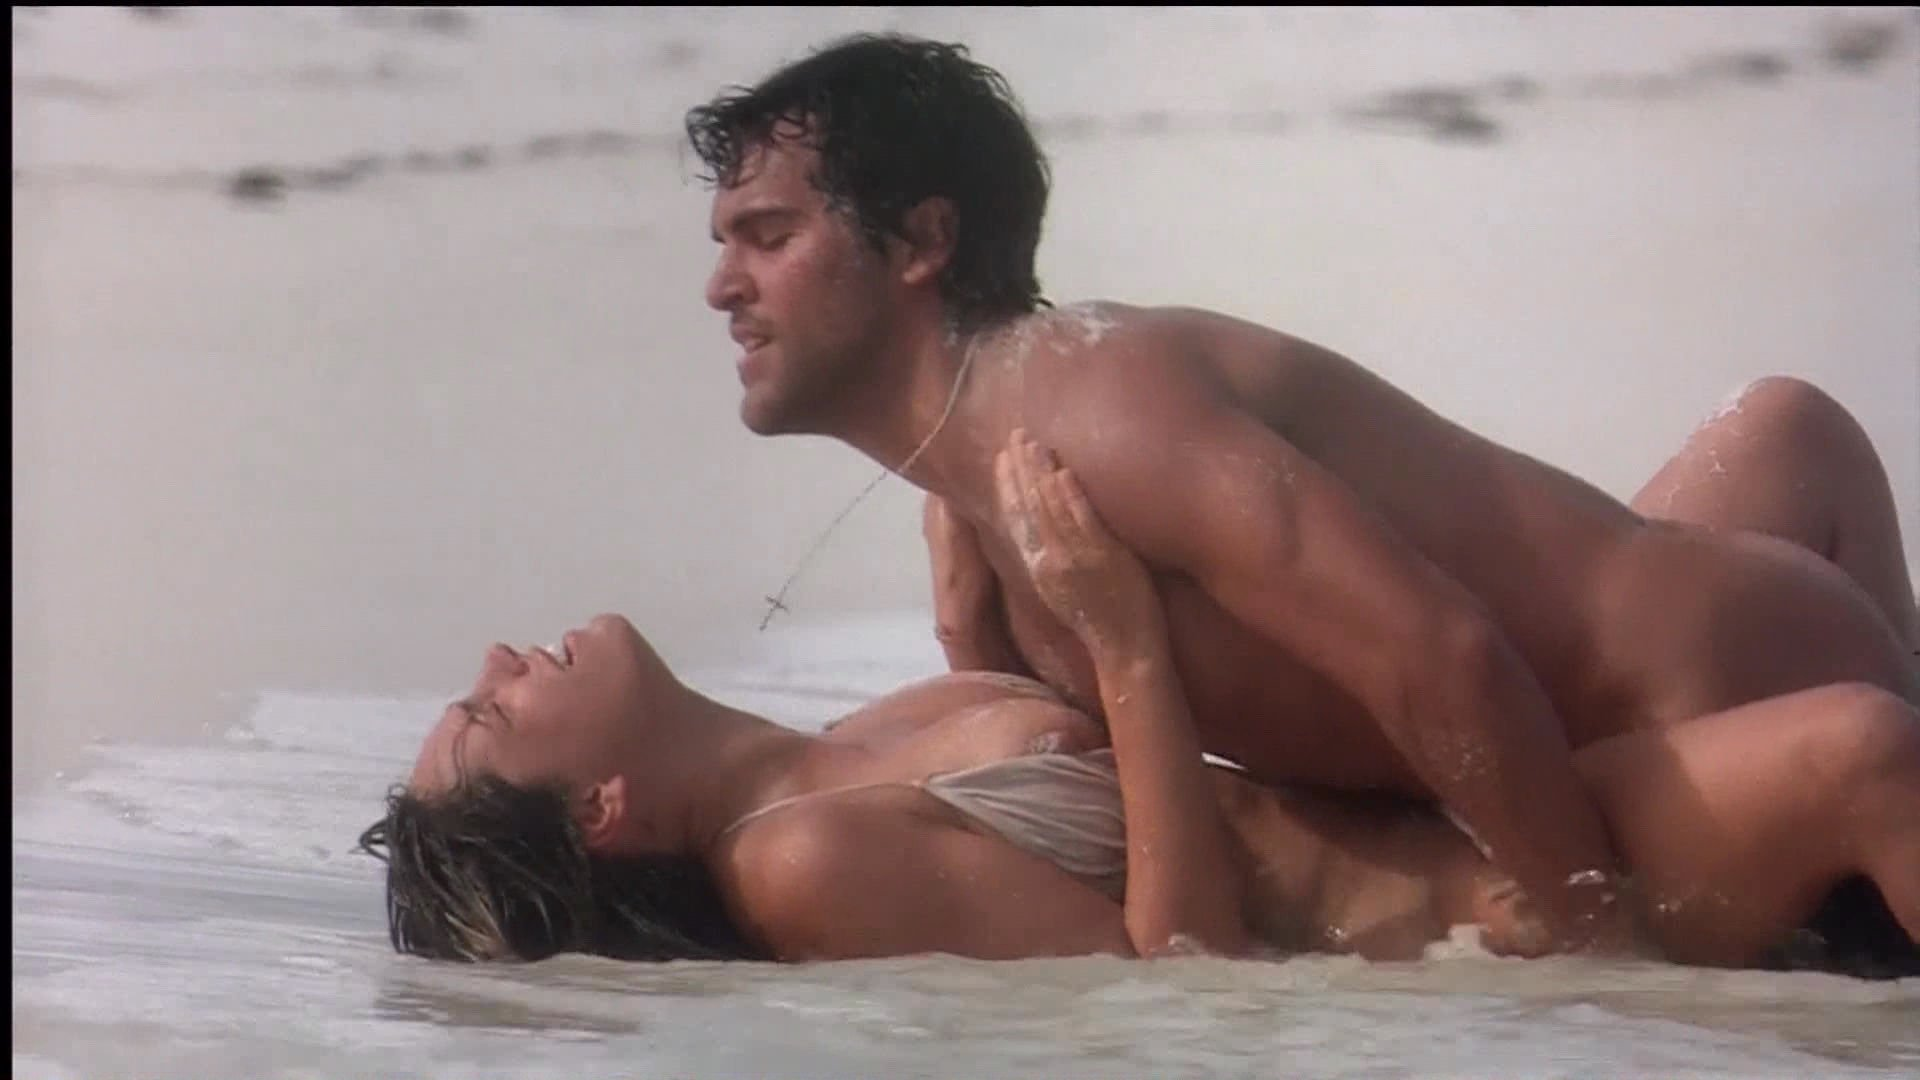 Nude beach fuck video